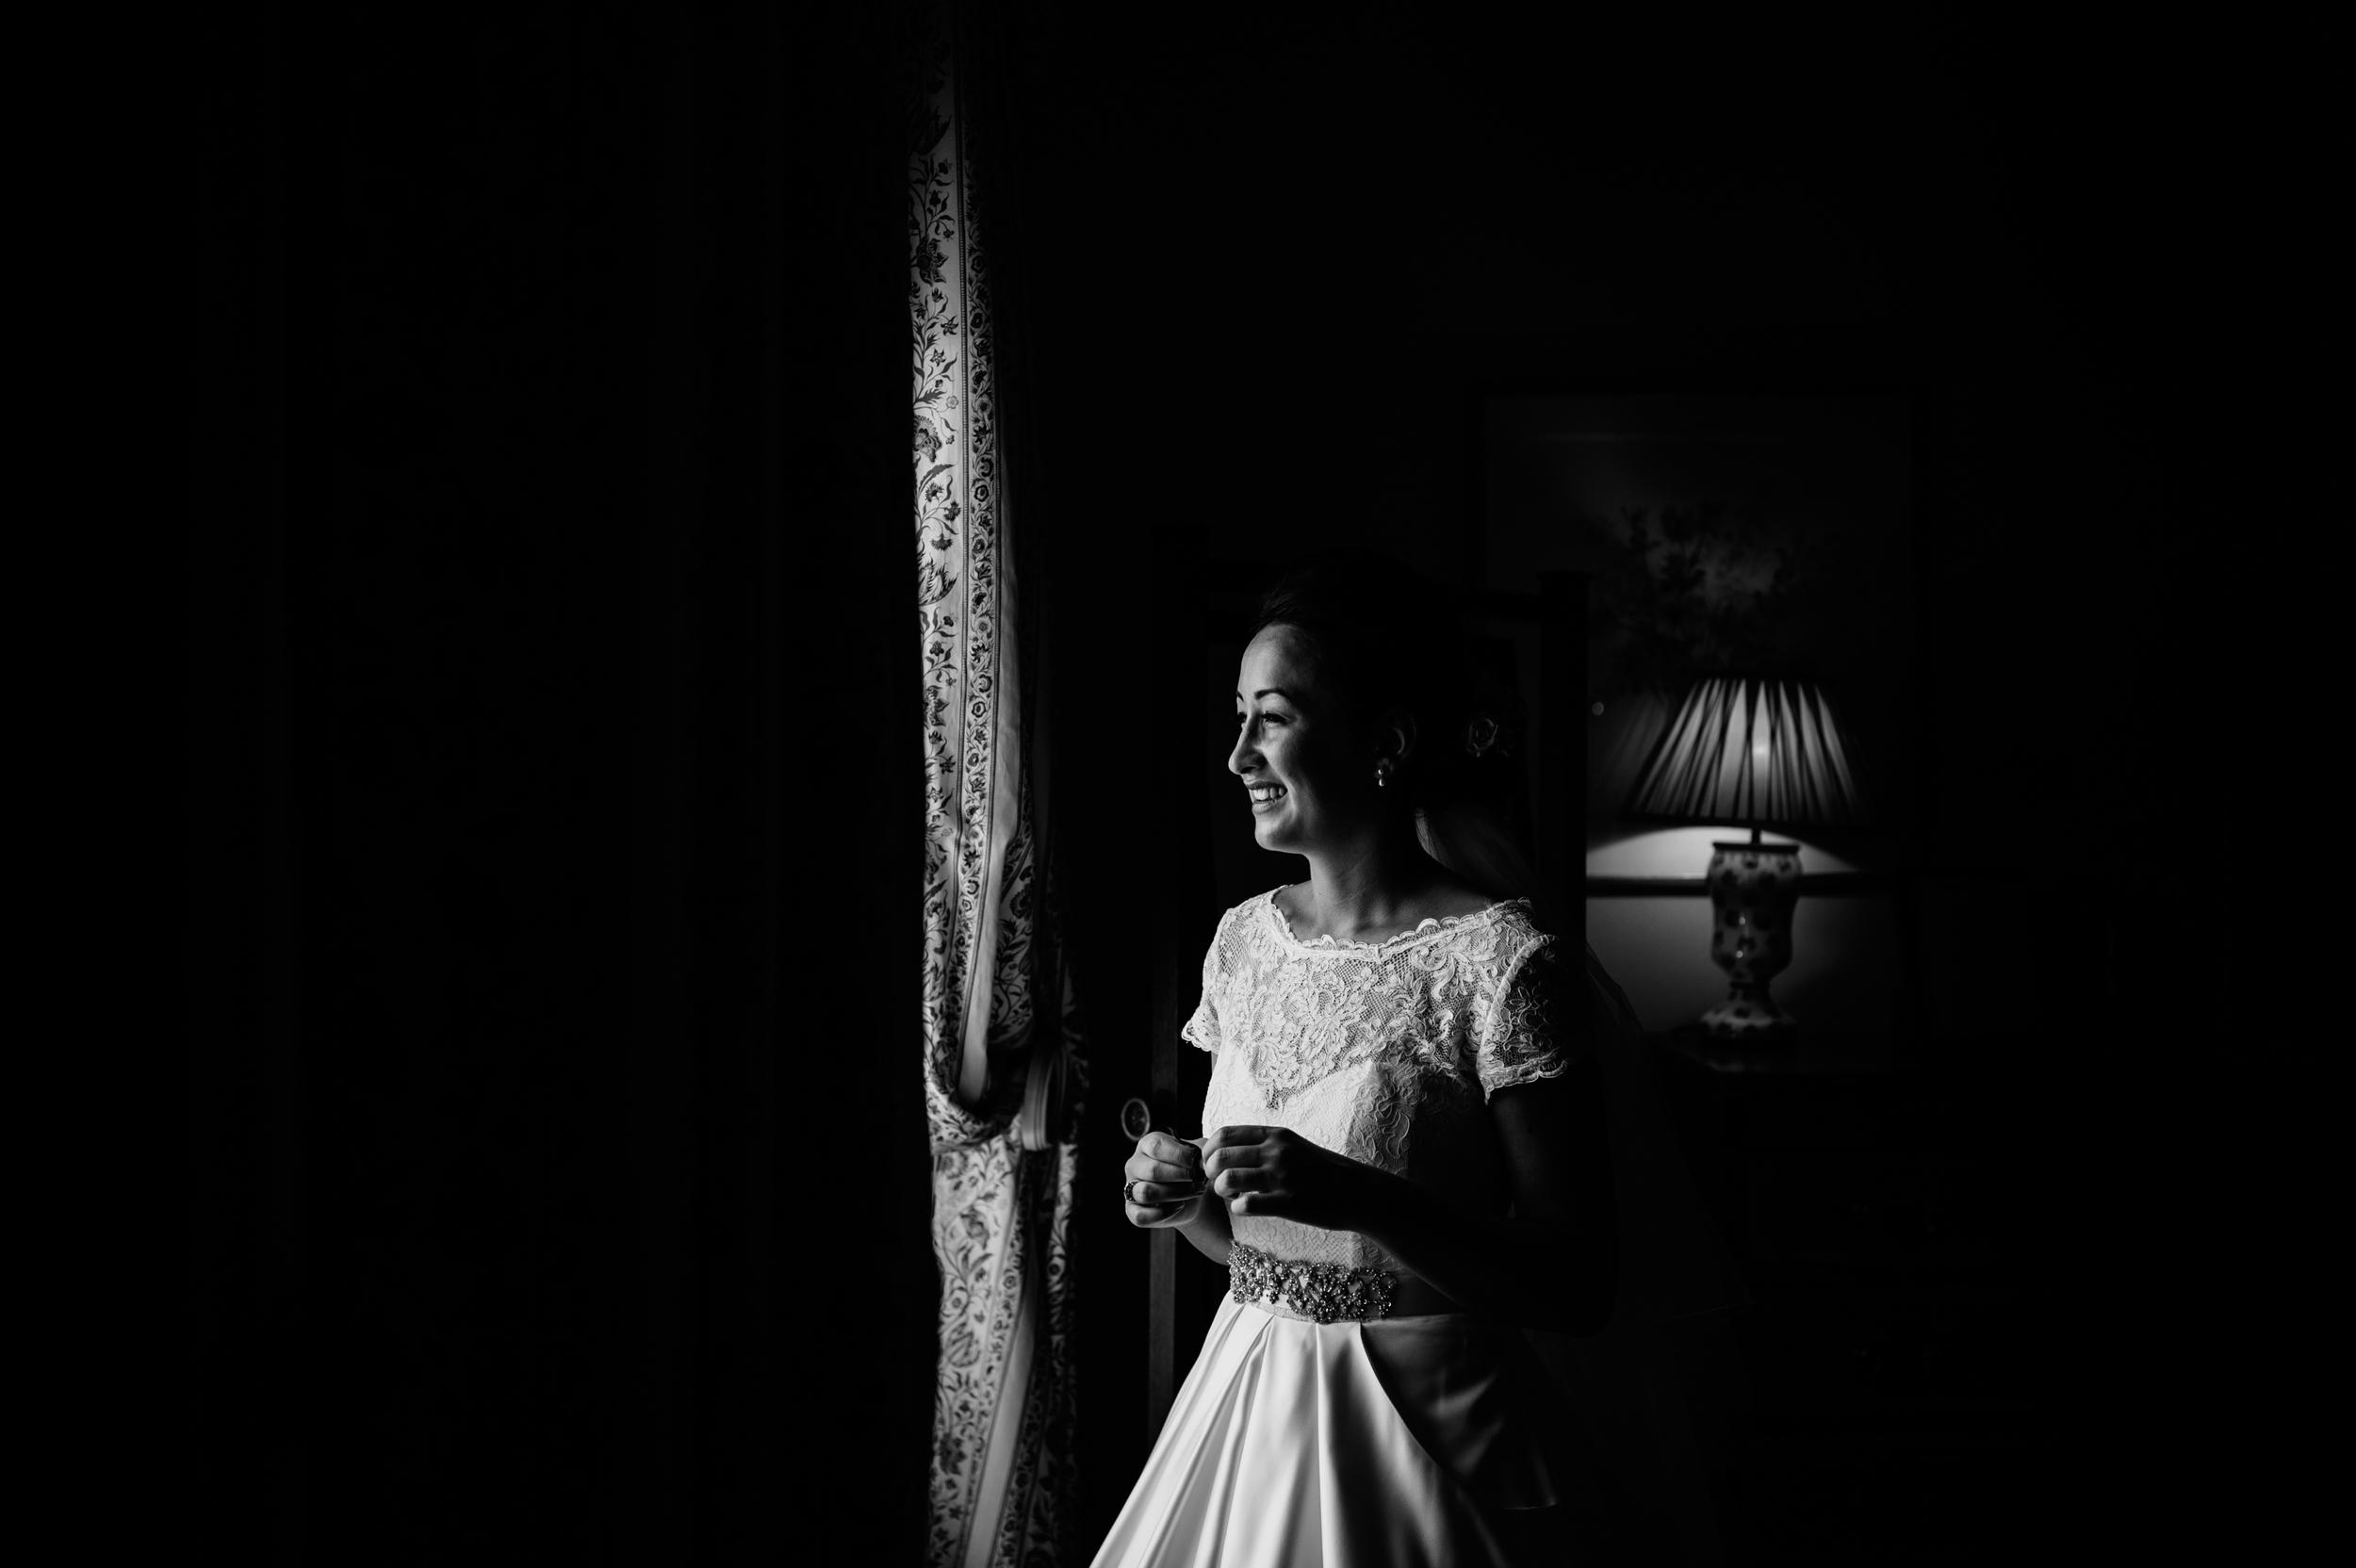 0081-lisa-devine-alternative-creative-wedding-photography-glasgow-edinburgh.JPG